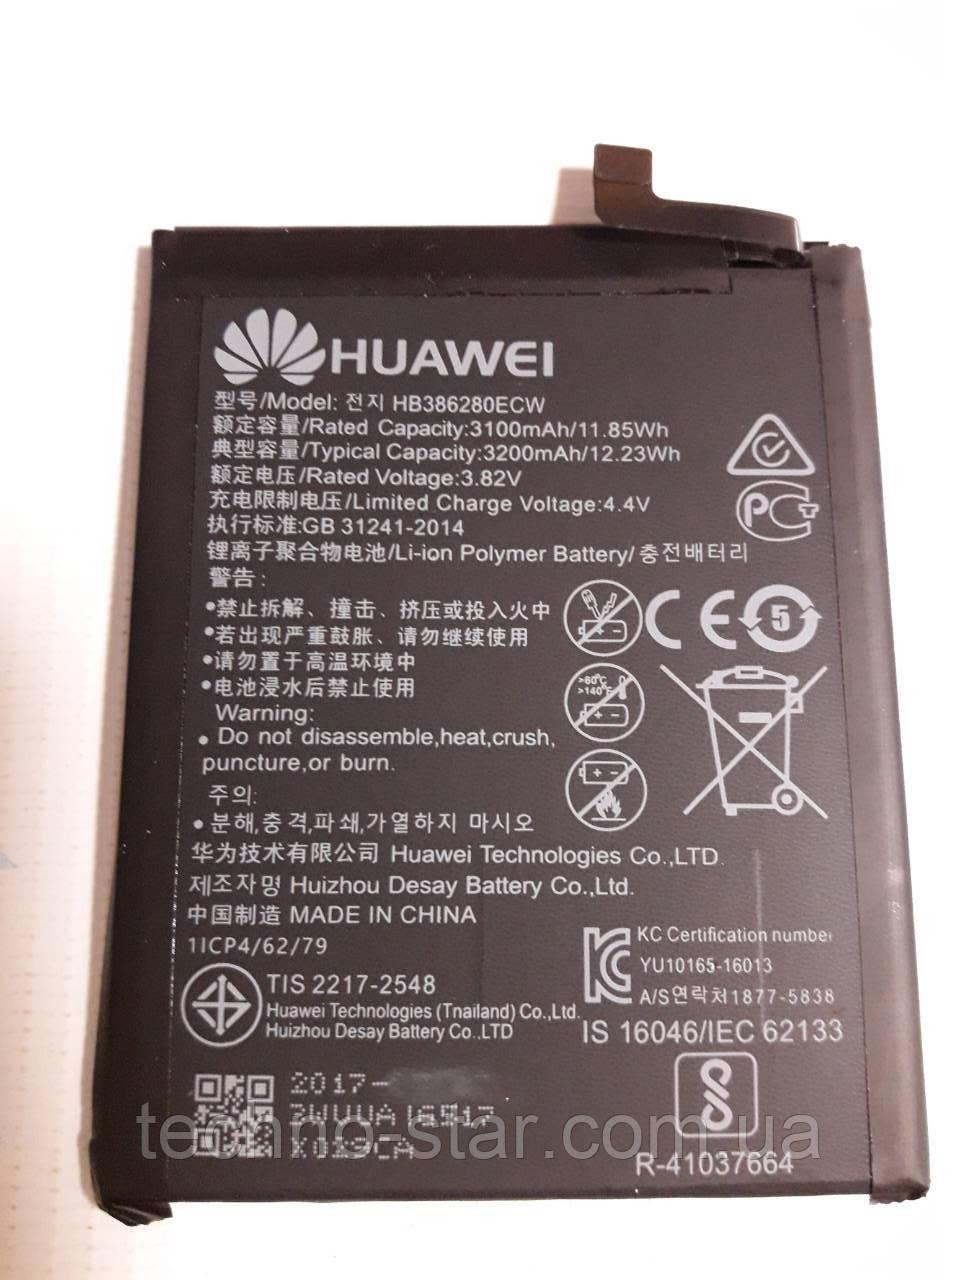 Оригинальный аккумулятор (АКБ, батарея) HB386280ECW для Huawei P10 | Honor 9 3200mAh